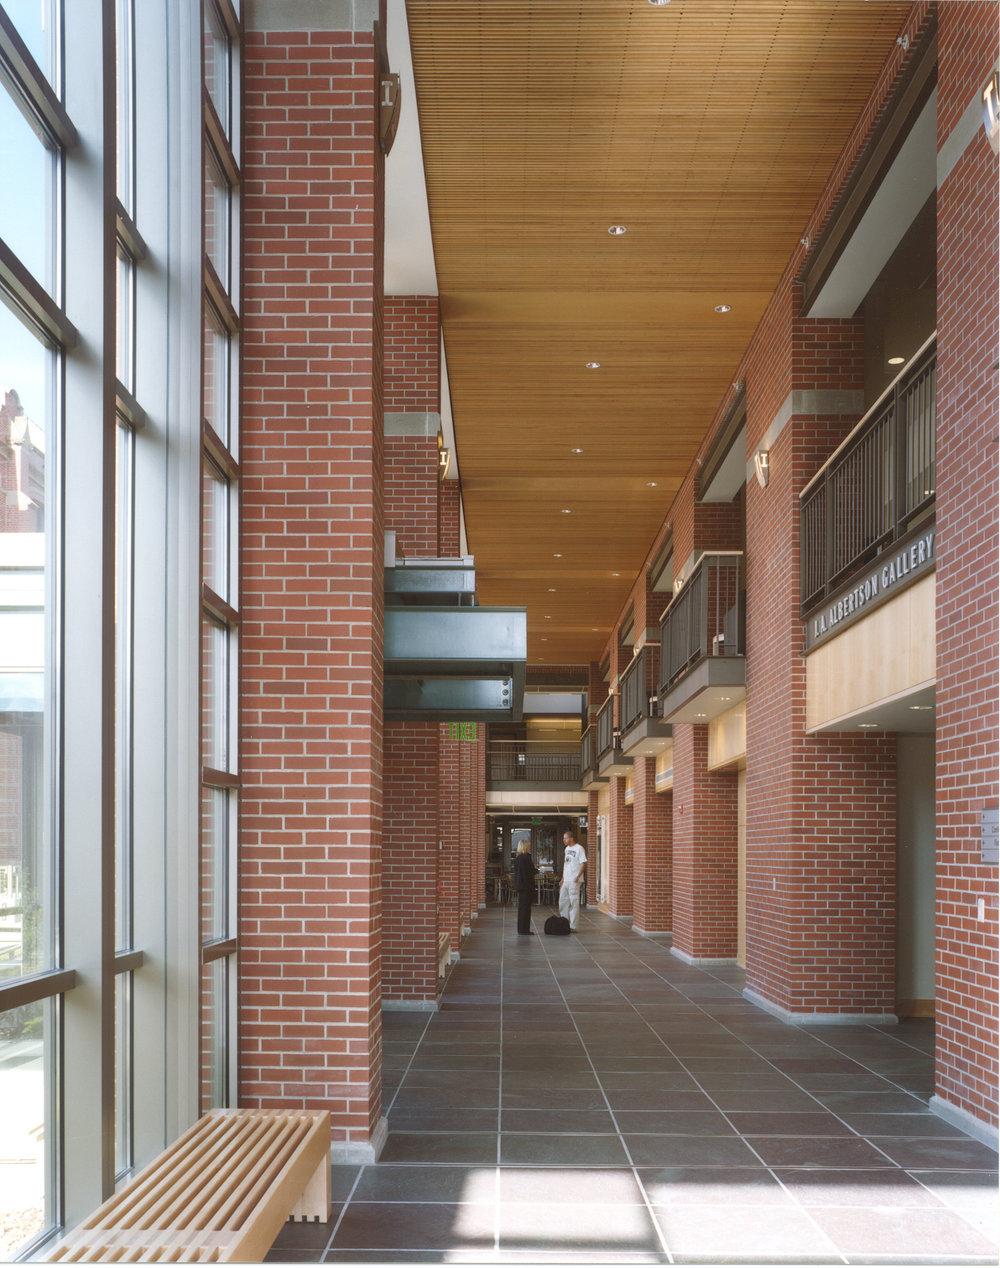 Interior-Hallway 2.jpg